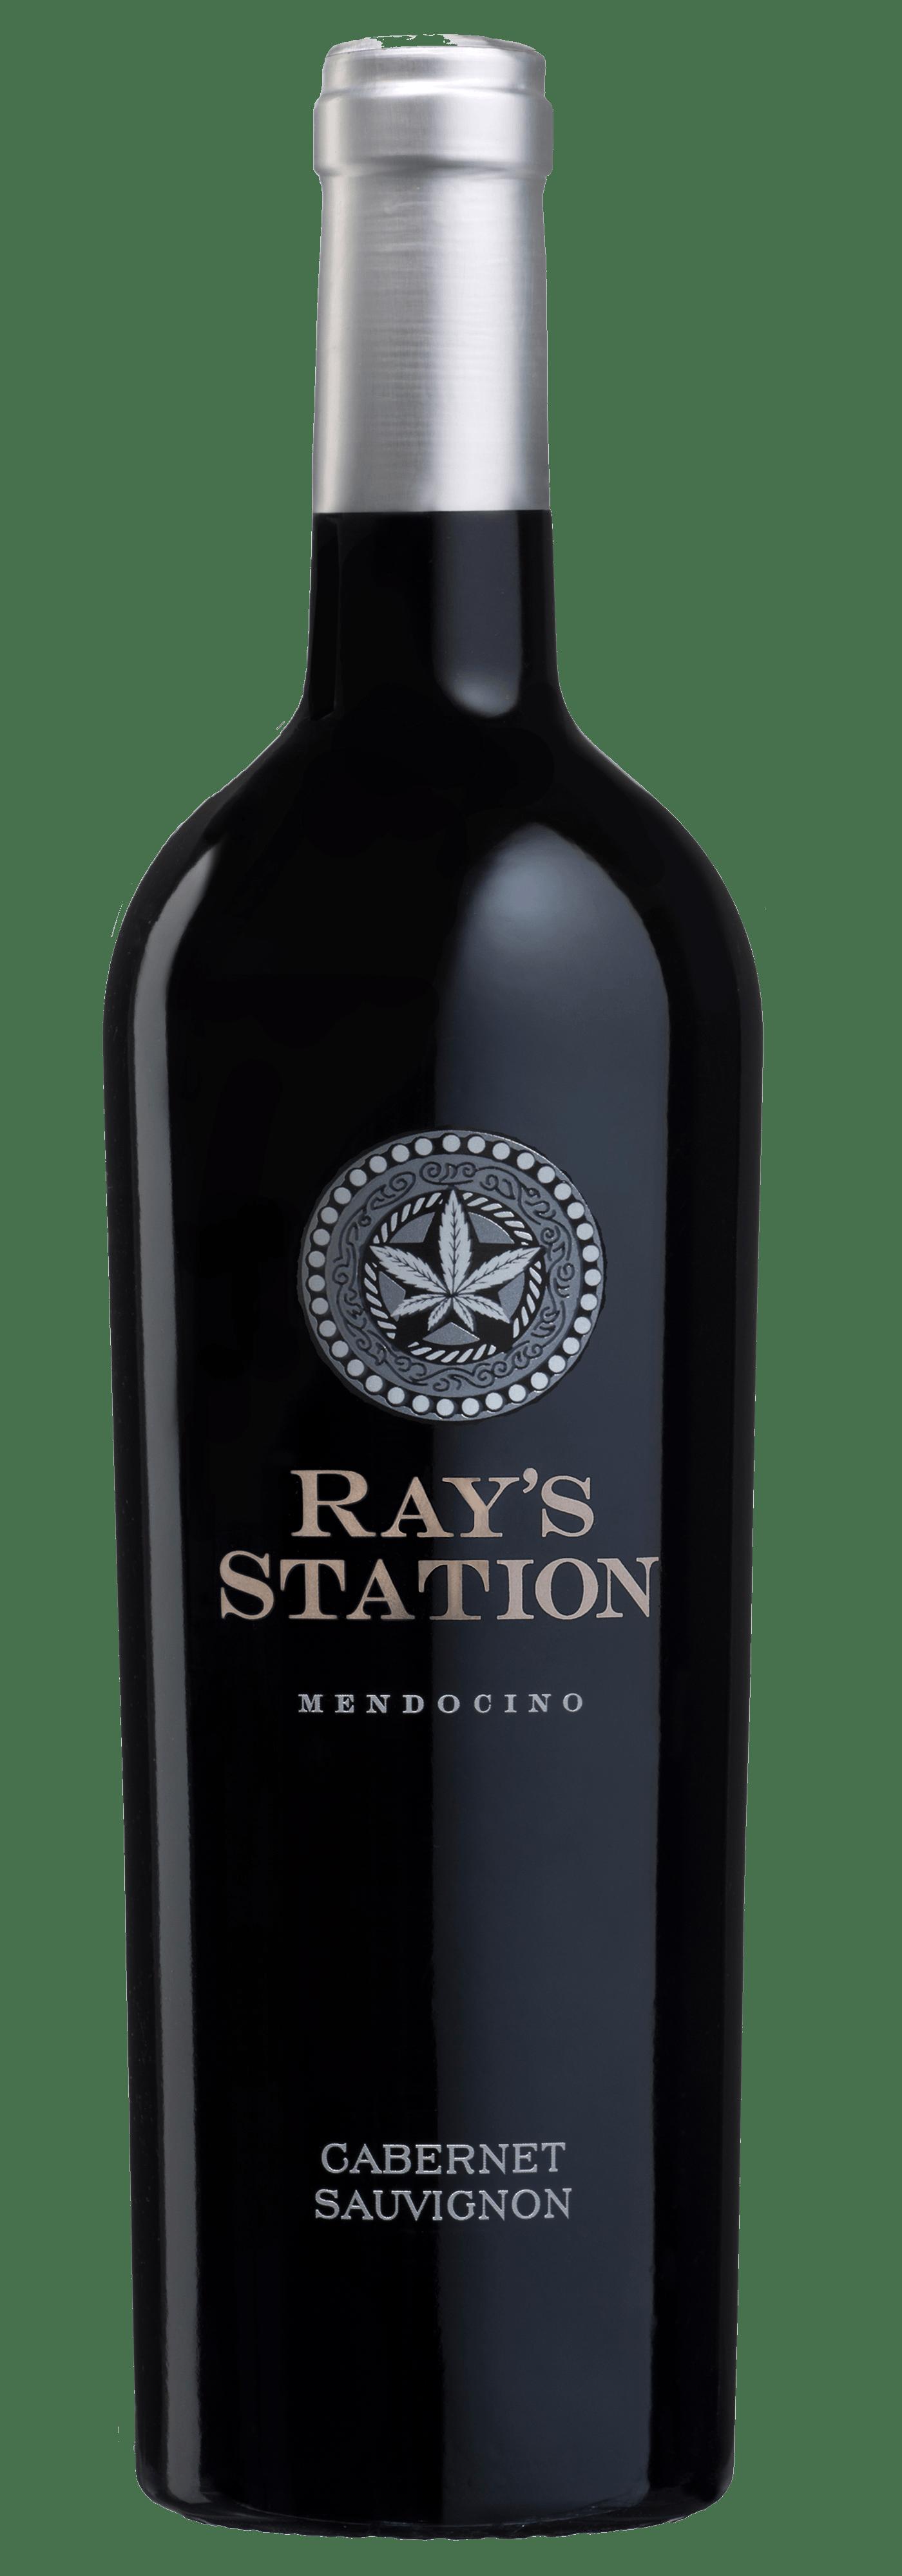 2014 Rays Station Cabernet Sauvignon, Mendocino County, 750ml